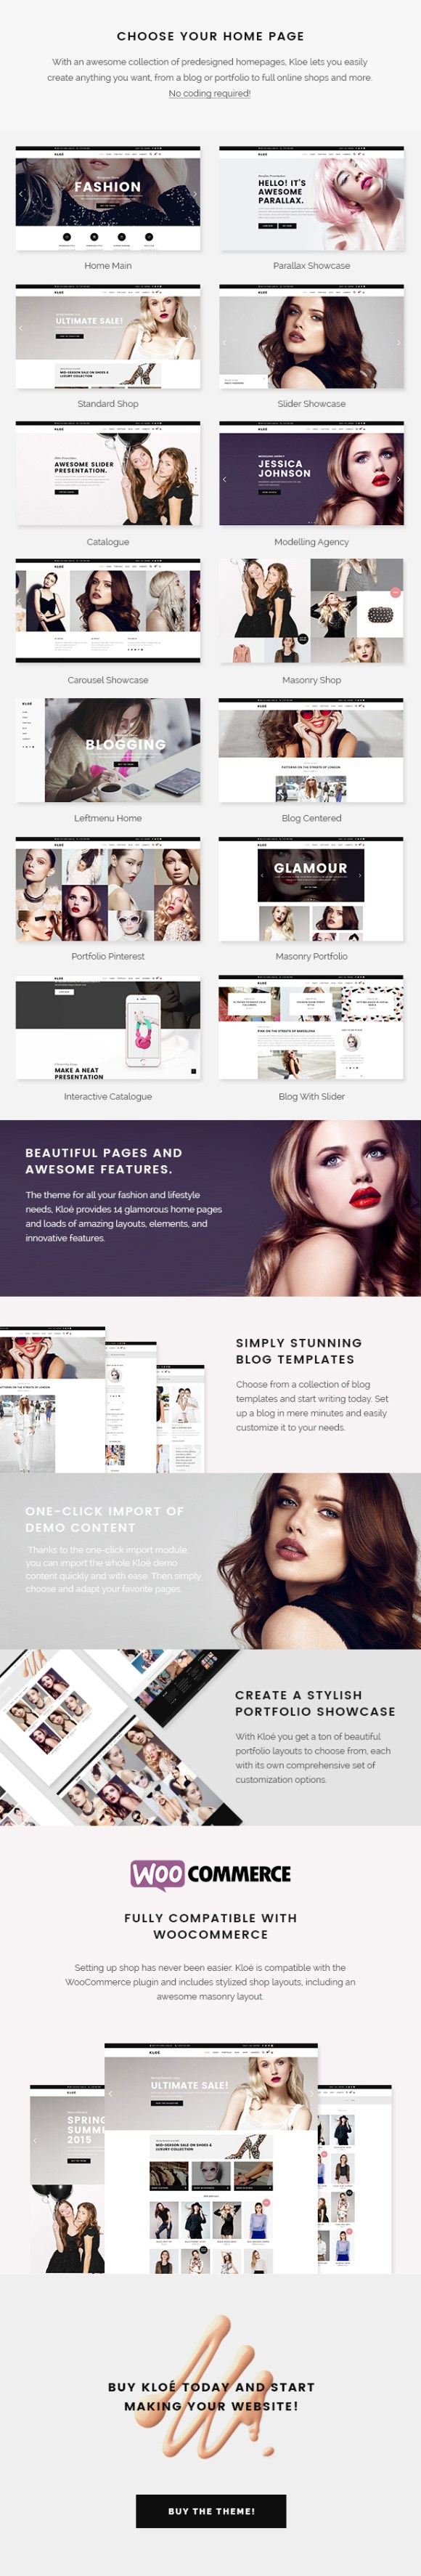 Kloe - Fashion & Lifestyle Multi-Purpose Theme - 1